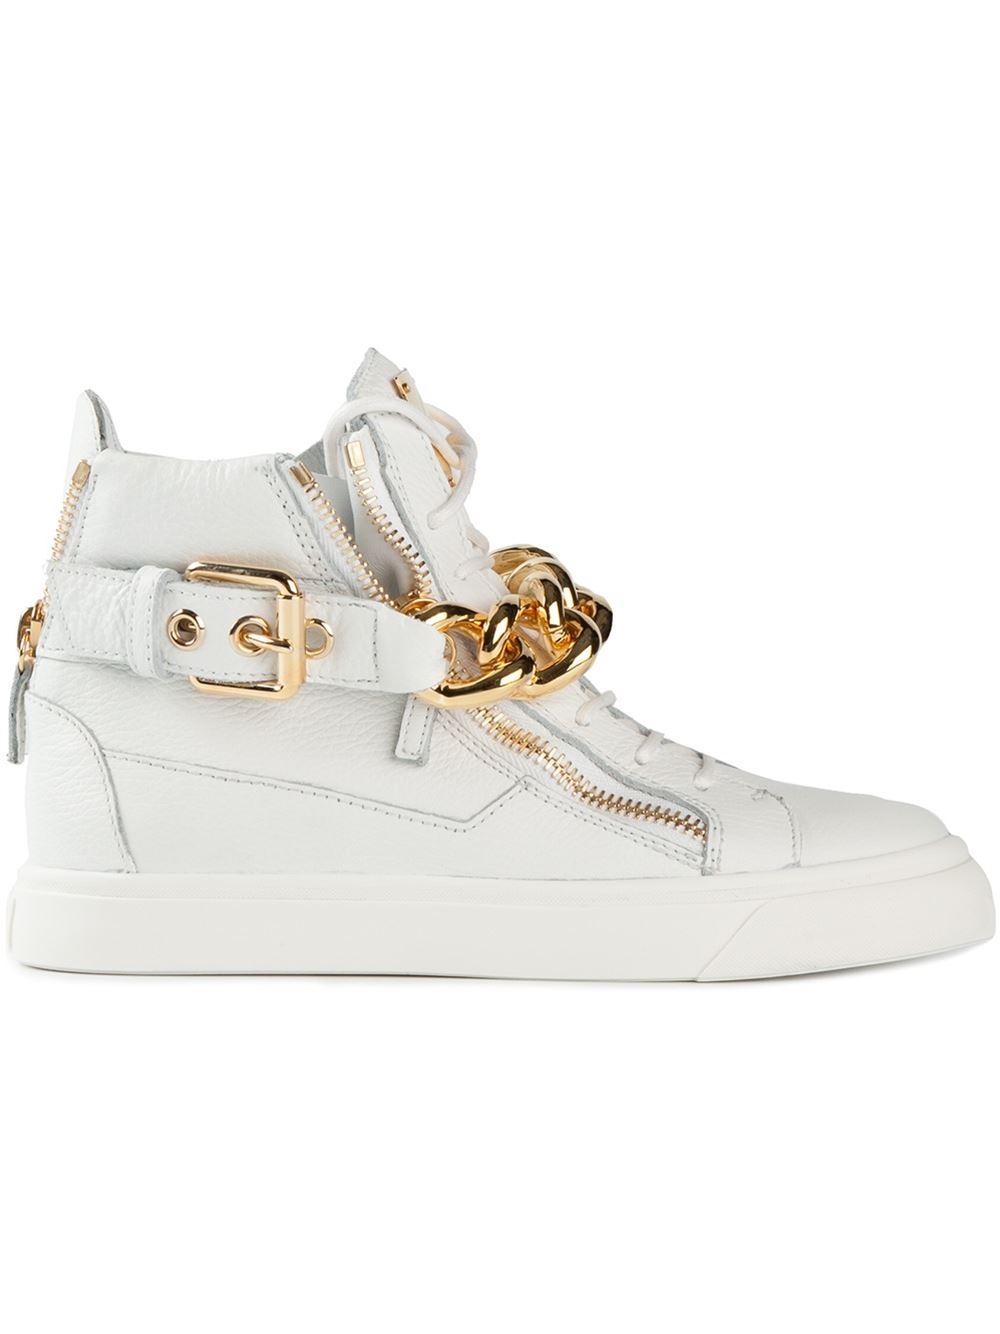 9147ca063777 Lyst - Giuseppe Zanotti Gold Chain Sneakers in White